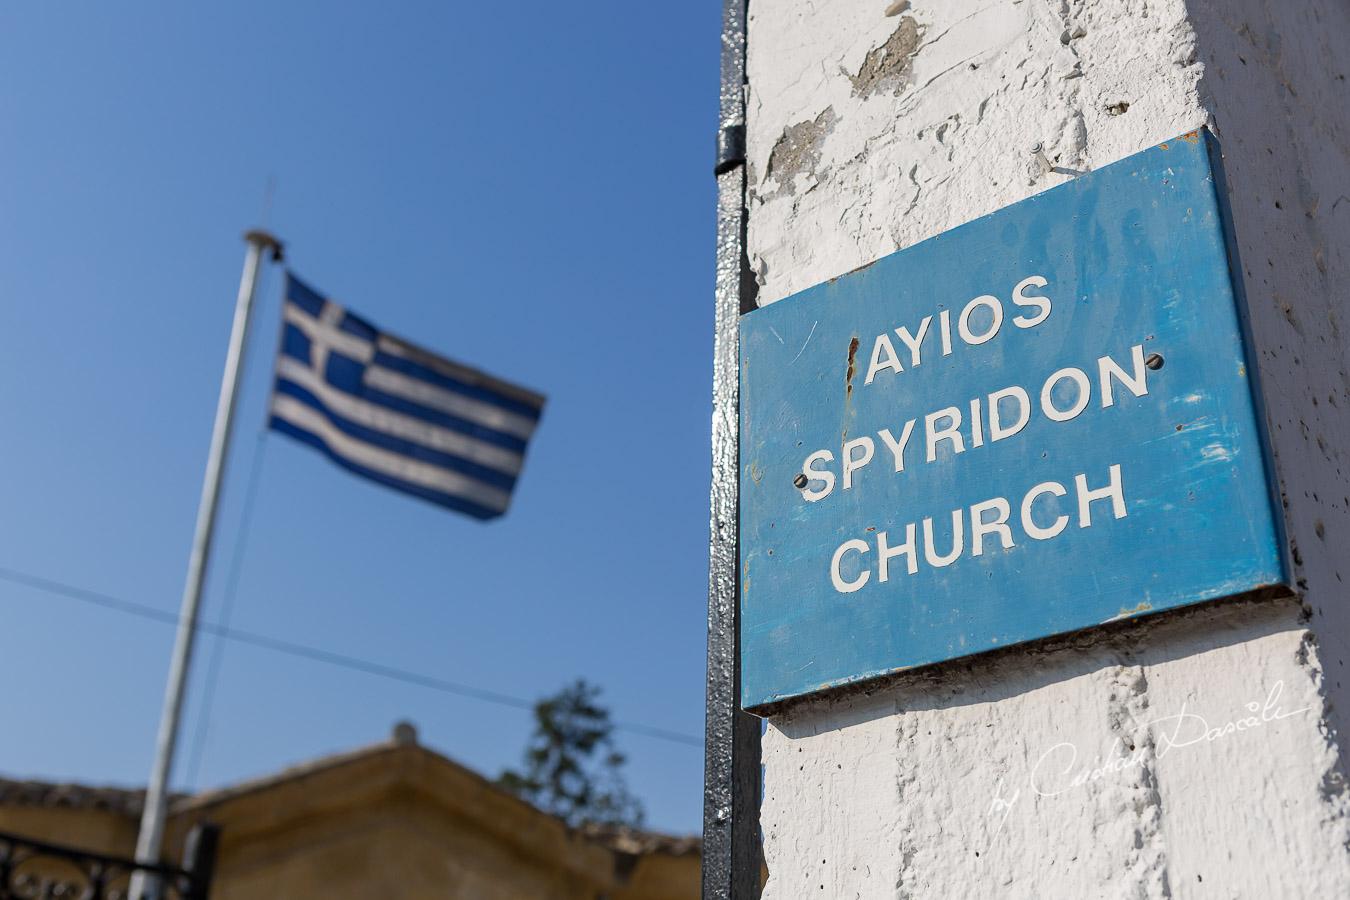 Baptism Photograher in Nicosia - Chrisanti's Christening by Cristian Dascalu - 01